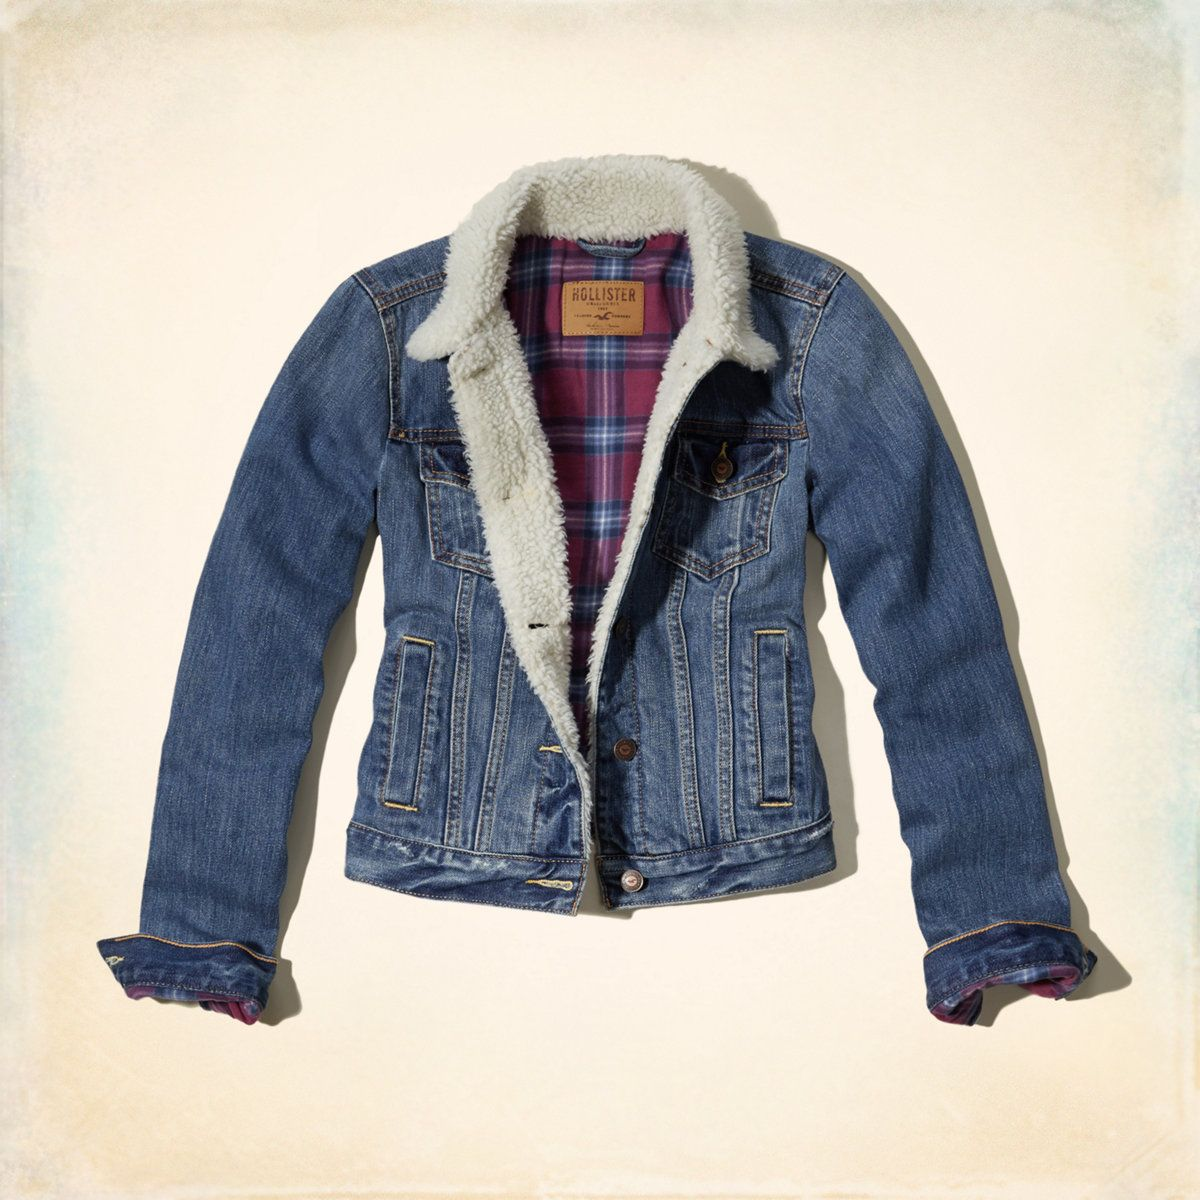 Hollister Classic Fit Denim Jacket Lined Denim Jacket Fitted Denim Jacket Girls Jacket [ 1200 x 1200 Pixel ]